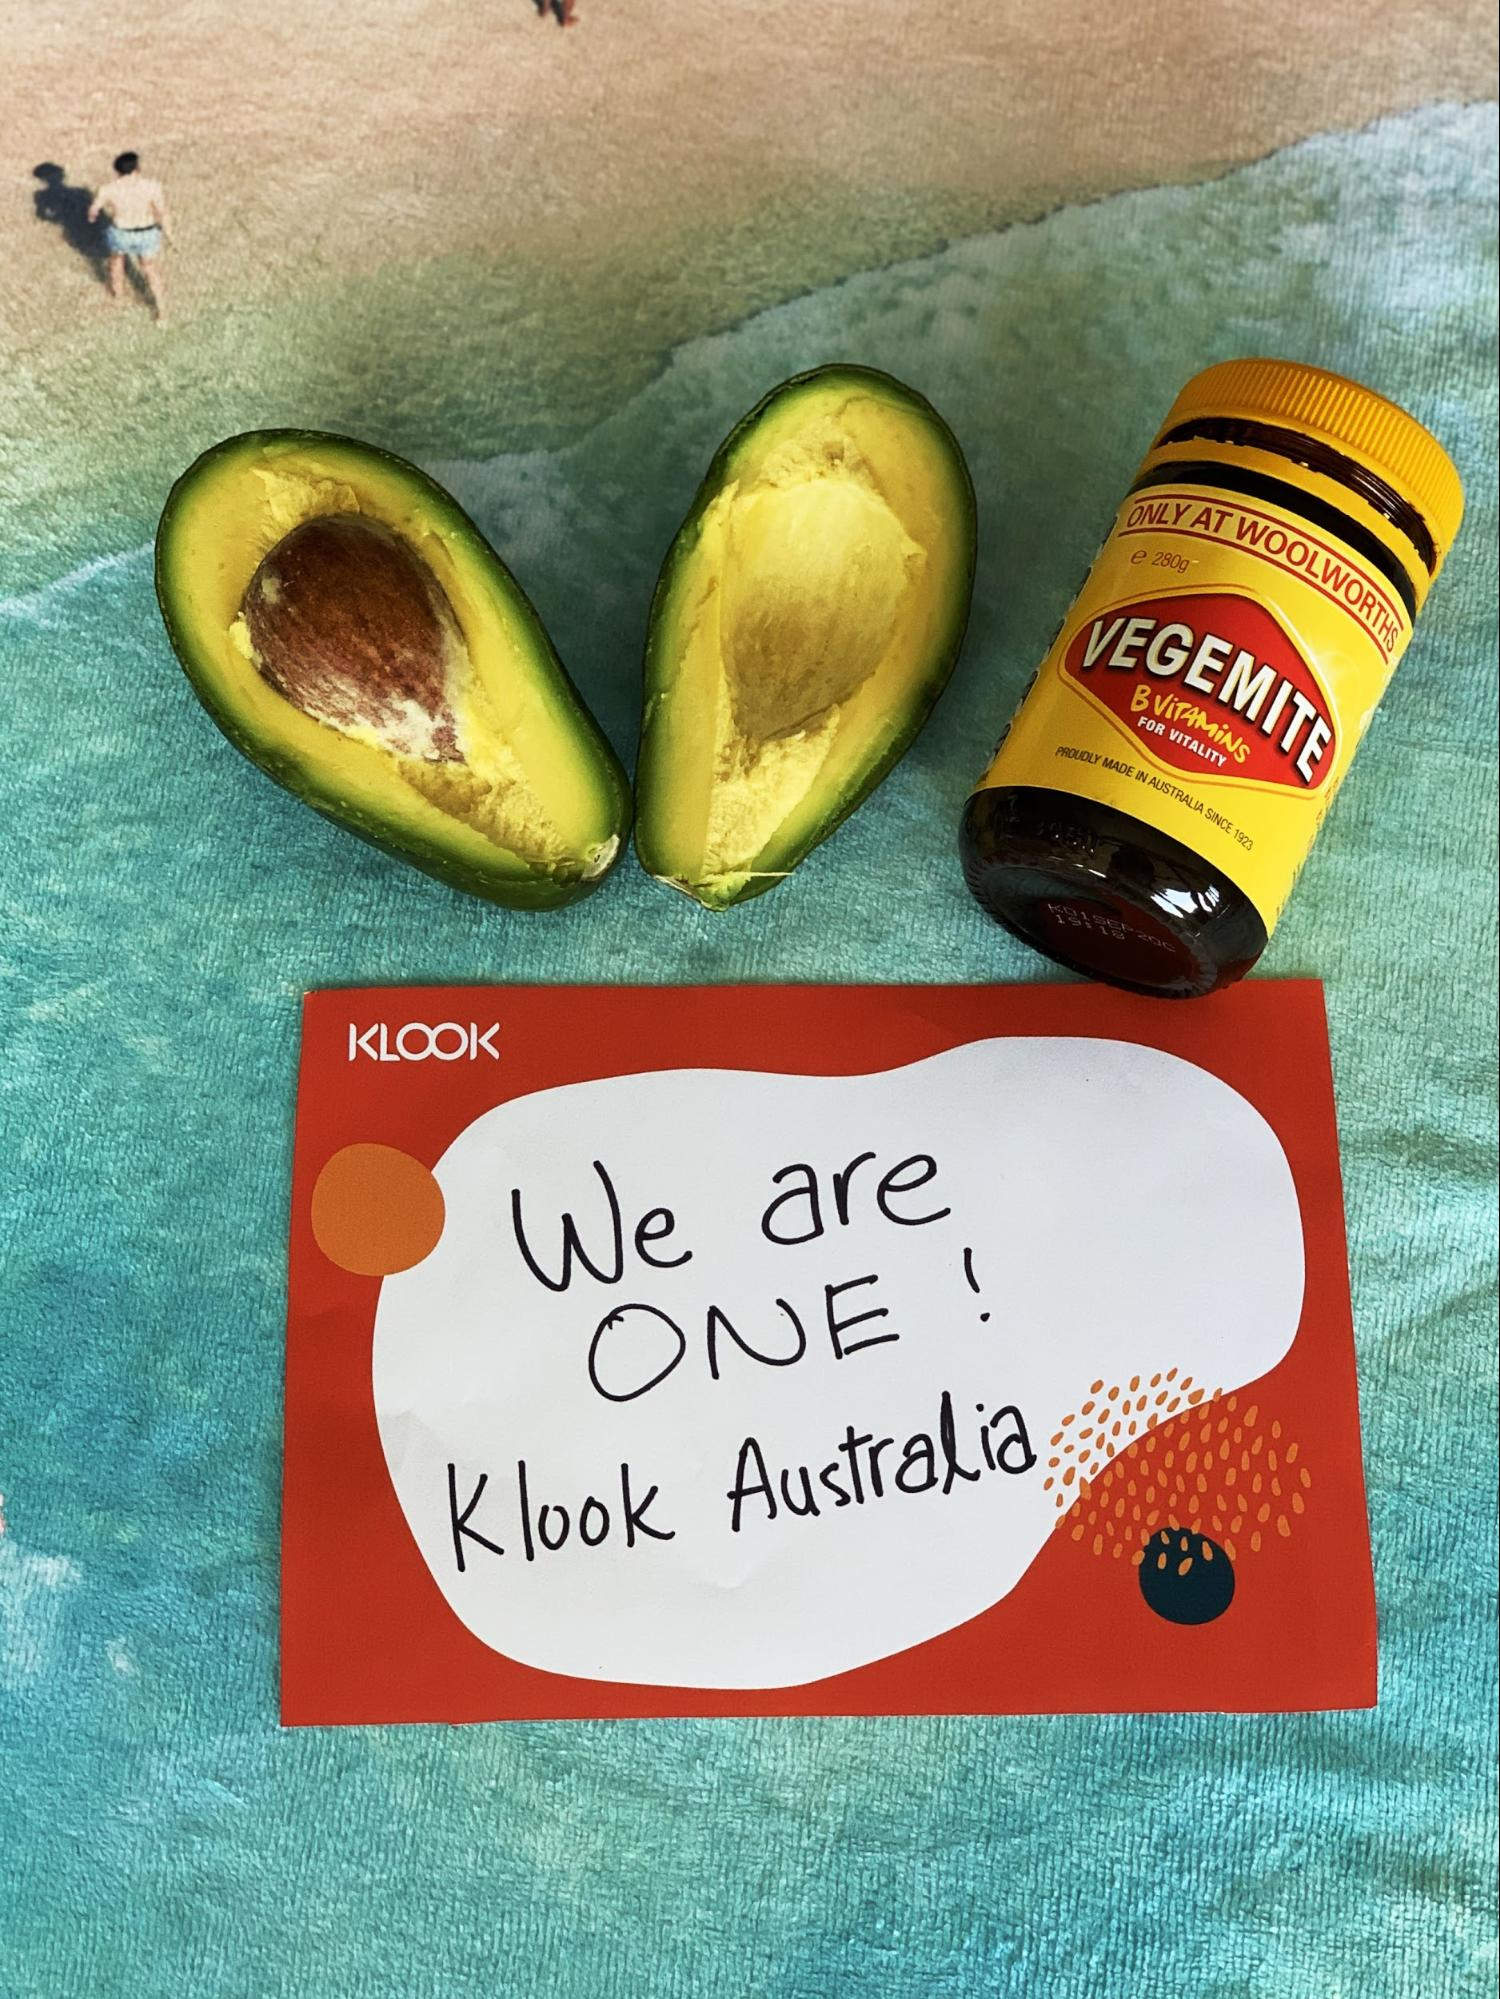 Vegemite and avocado from Australia